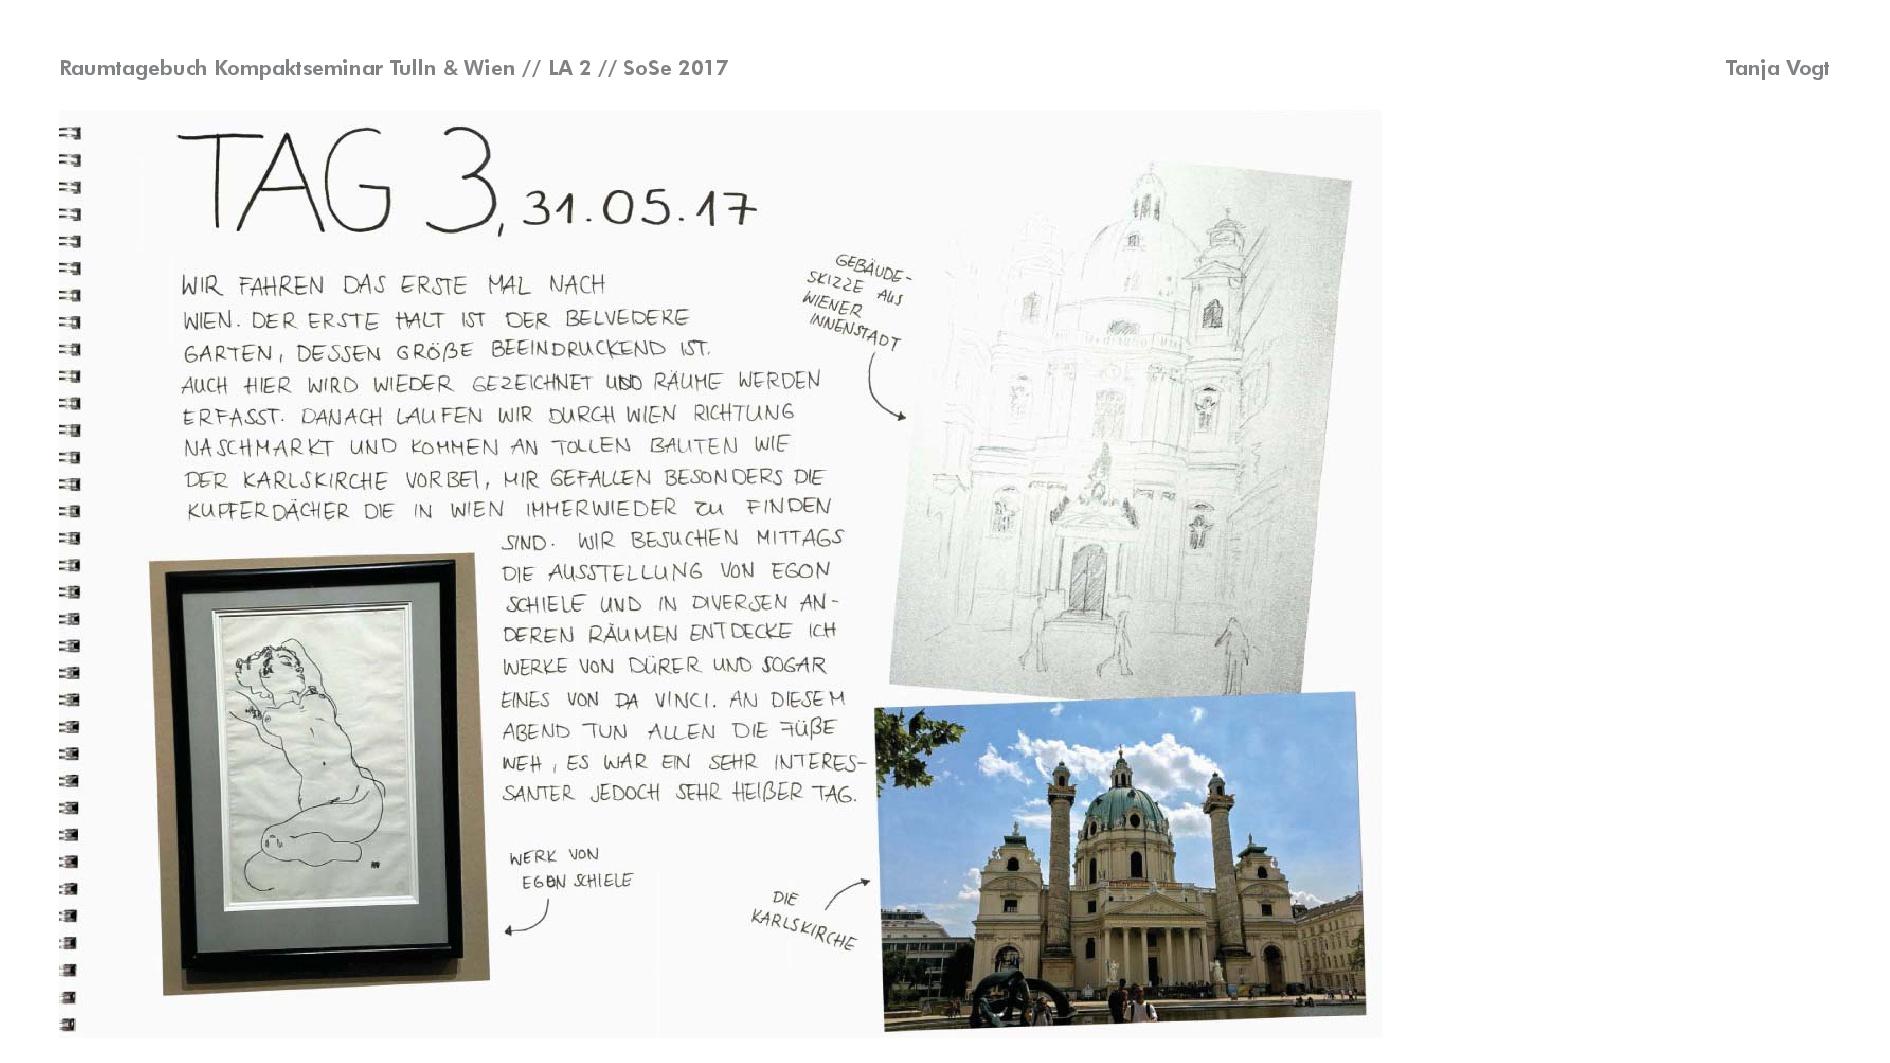 NEU Screen Raumtagebuch Tulln Wien SoSe 17 034